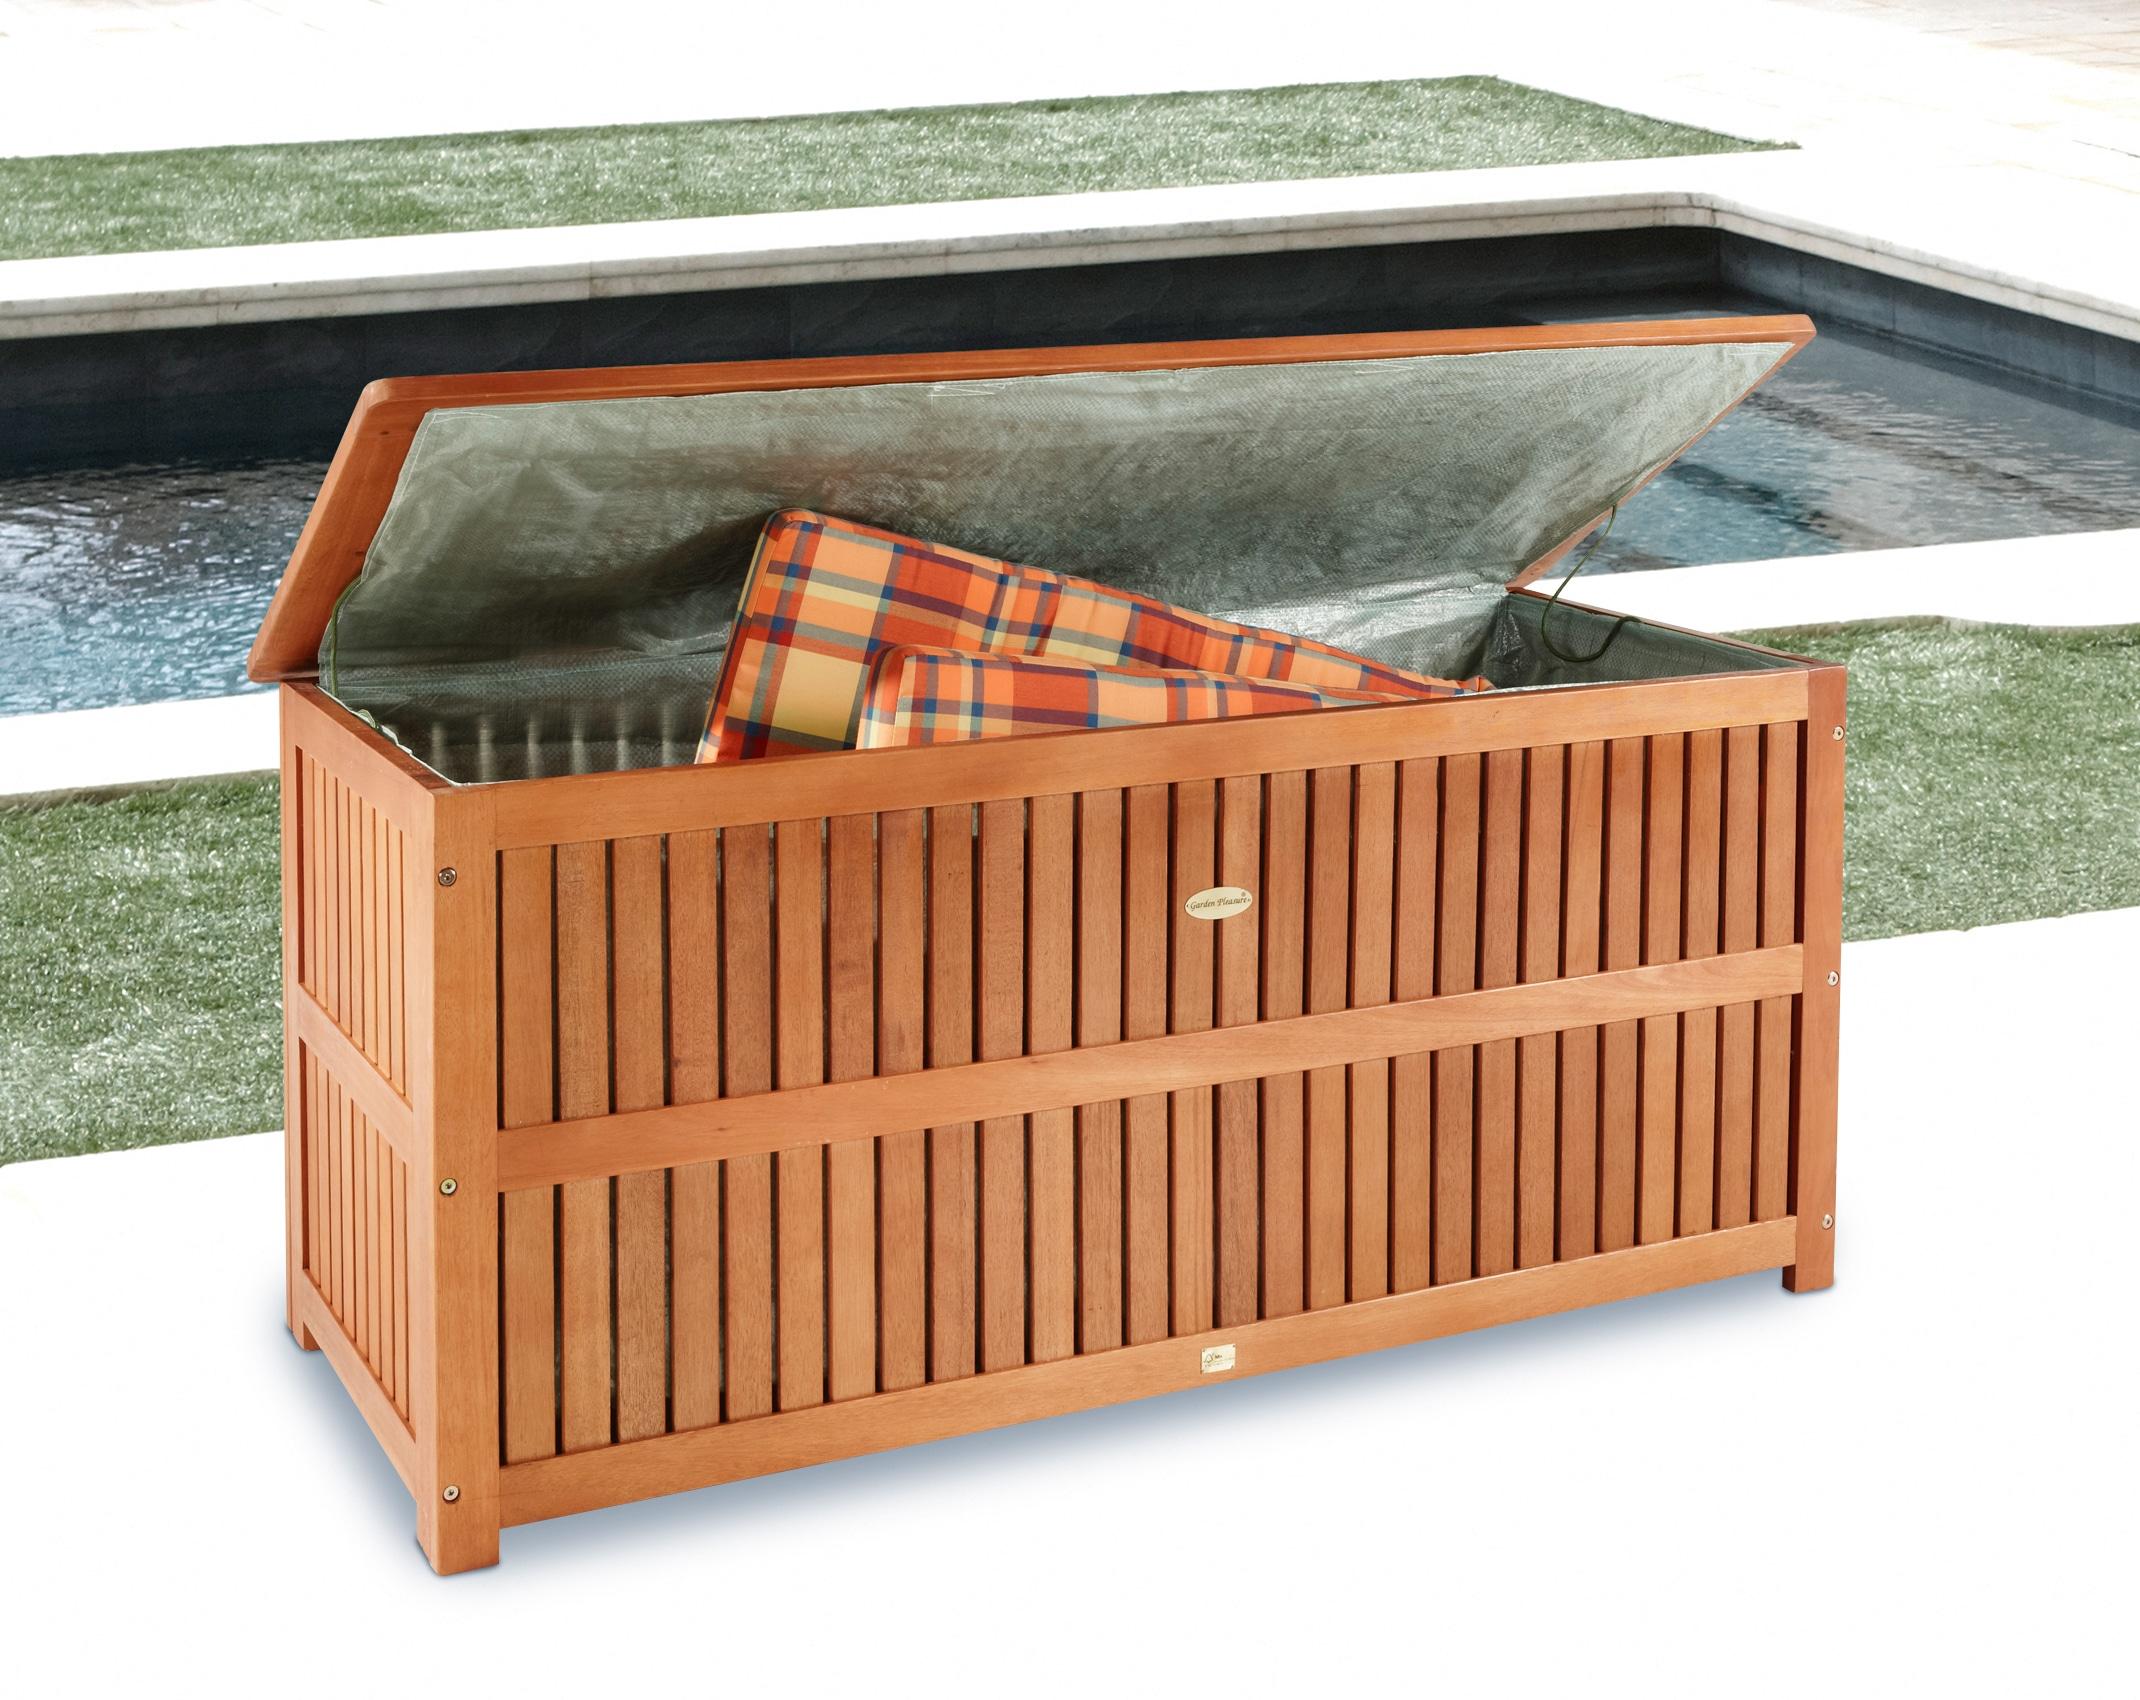 Image of Auflagenbox, 130x58x55 cm, Eukalyptusholz, braun